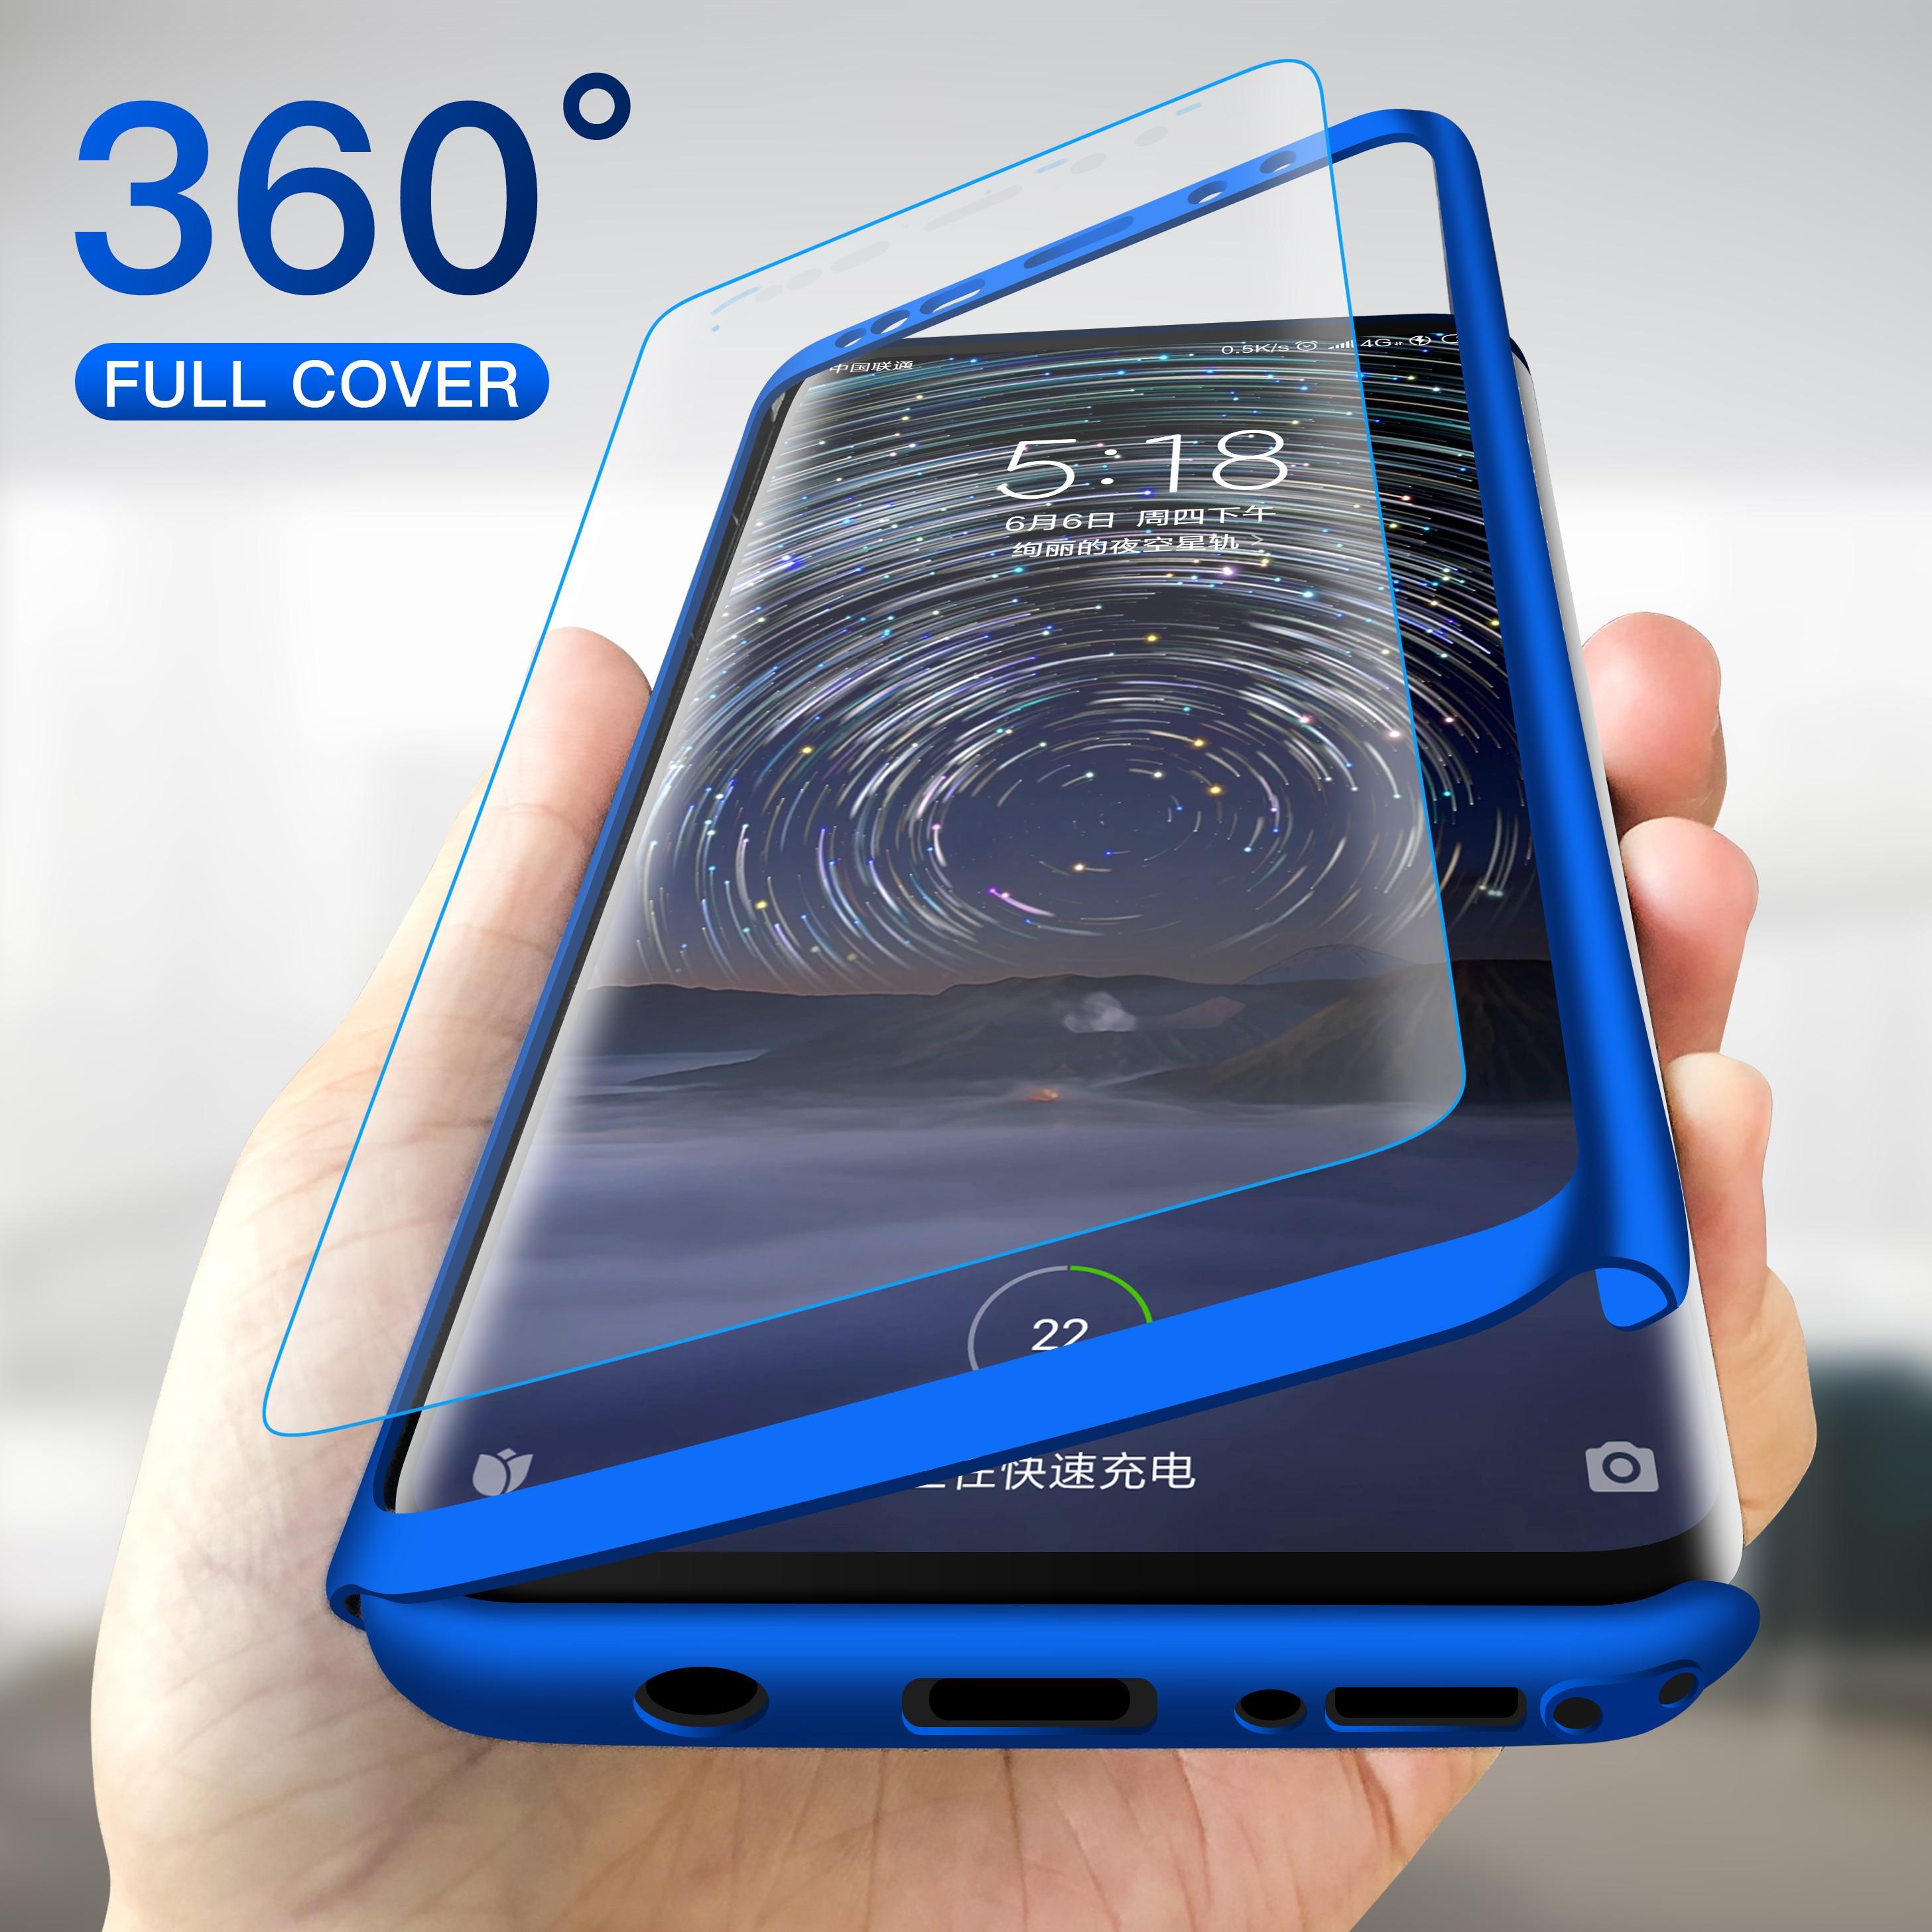 Роскошный чехол 360 градусов для Samsung Galaxy S7 Edge S8 S9 S10 Plus S10E Note 8 9 ударопрочный чехол M10 A10 A20 A30 A40 A50 A70